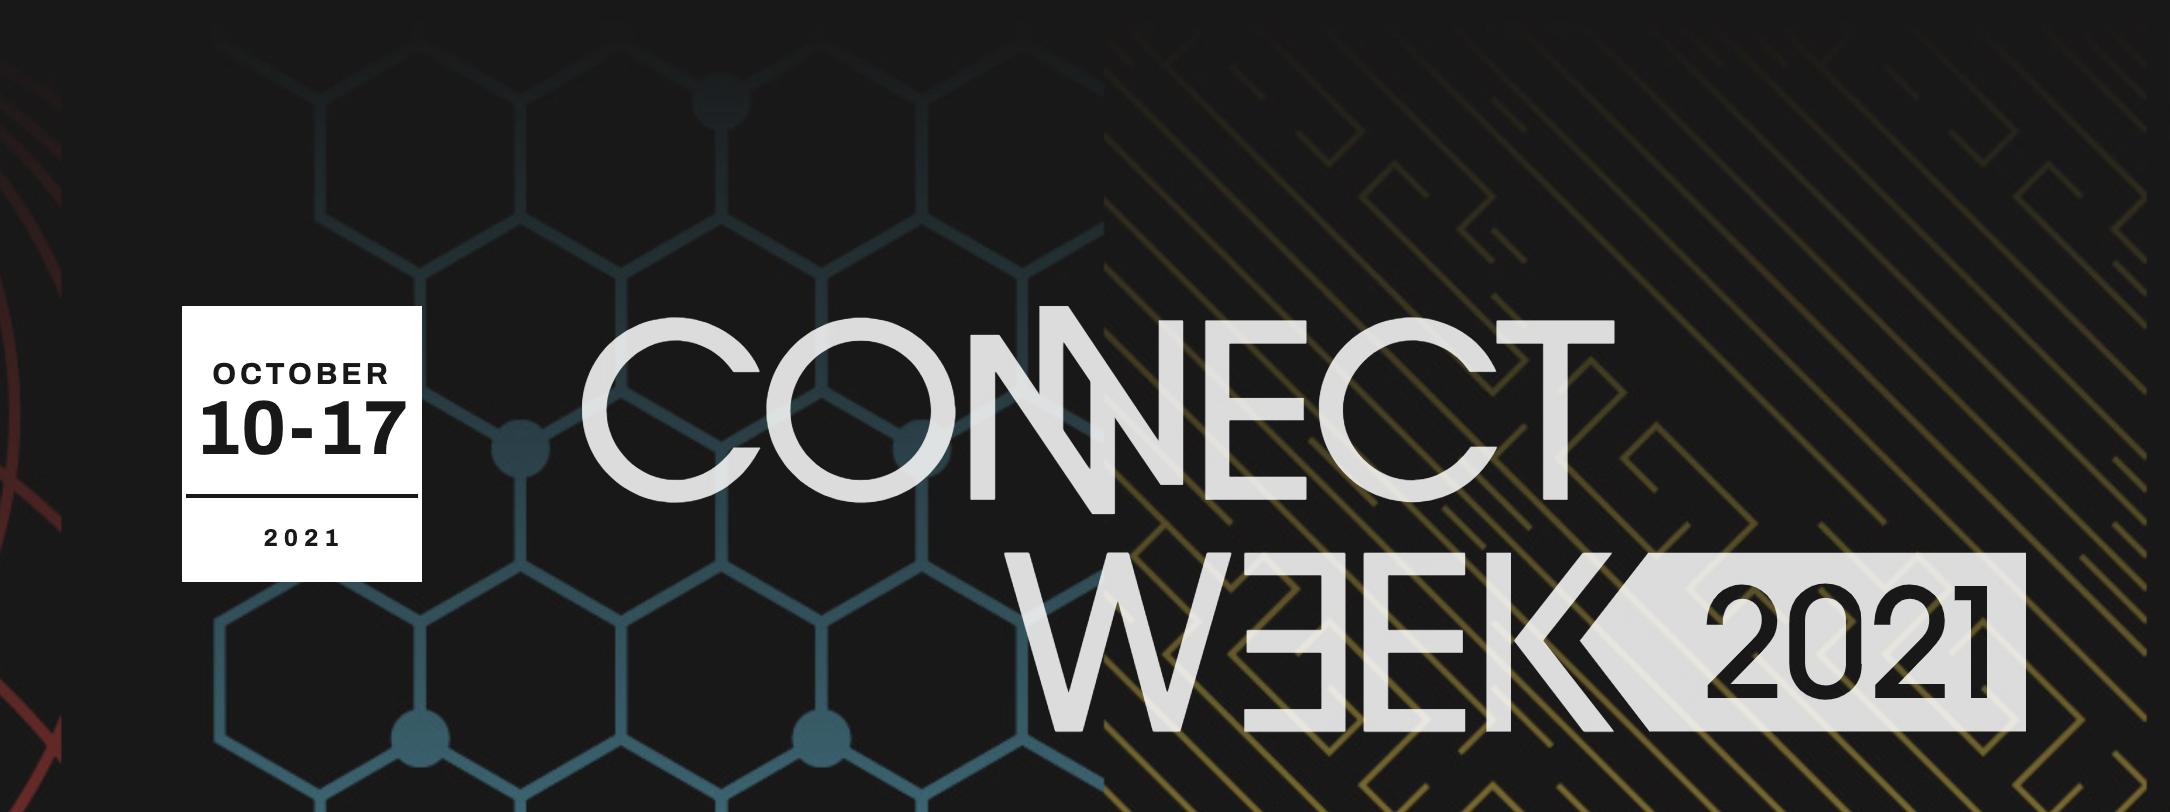 Innovate Pasadena Presents: Connect Week 2021